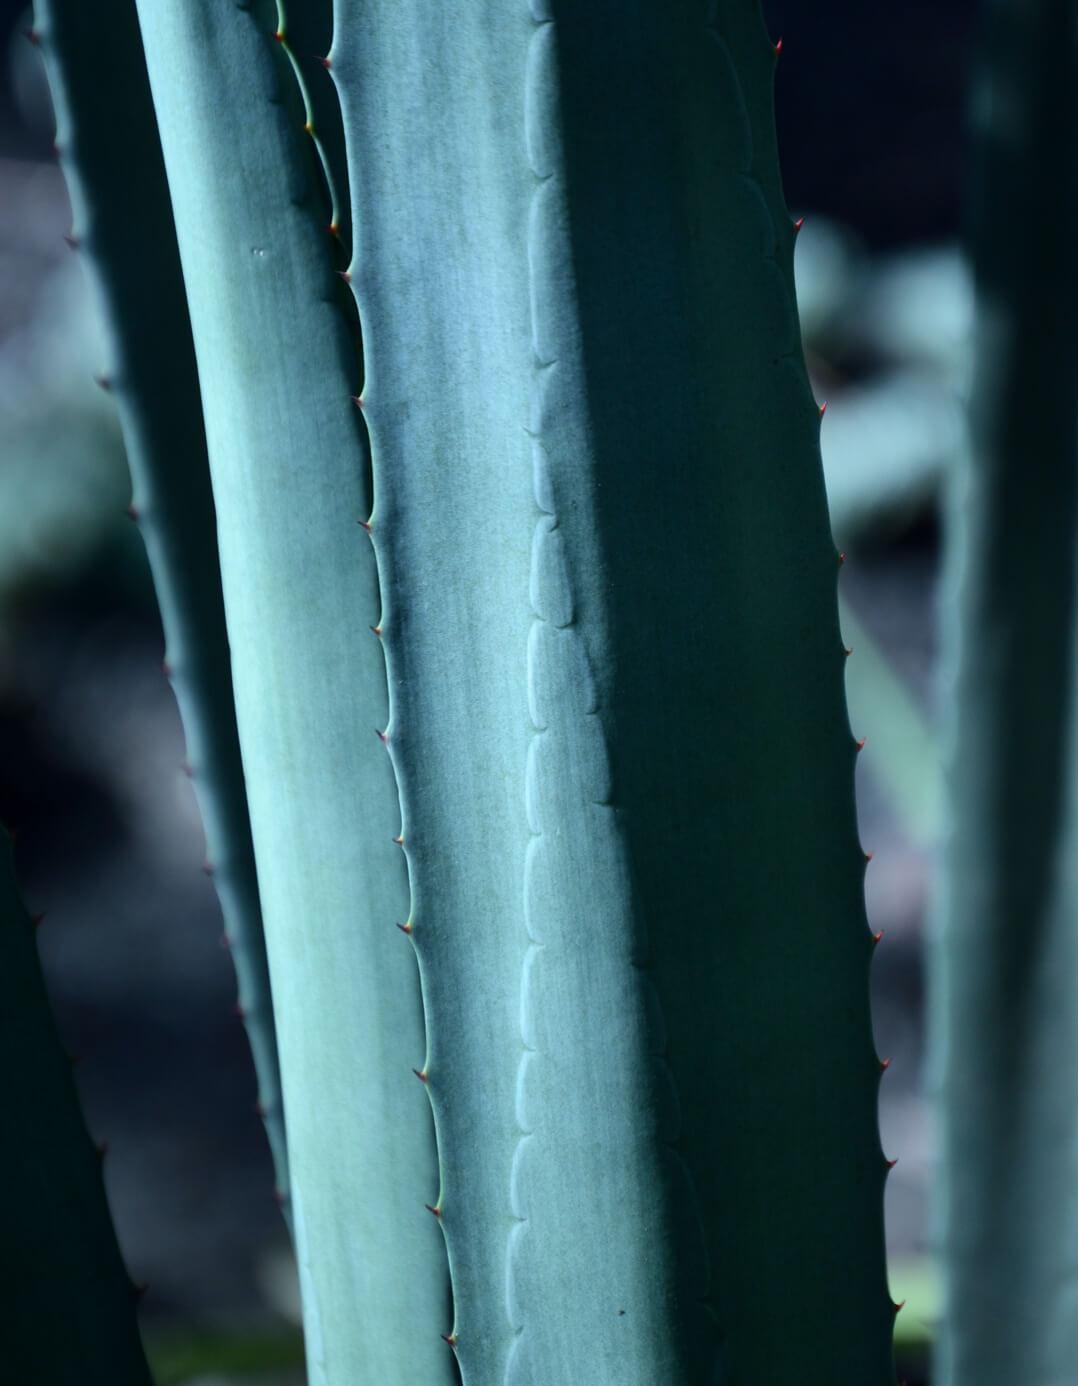 los arango tequila blue weber agave closeup